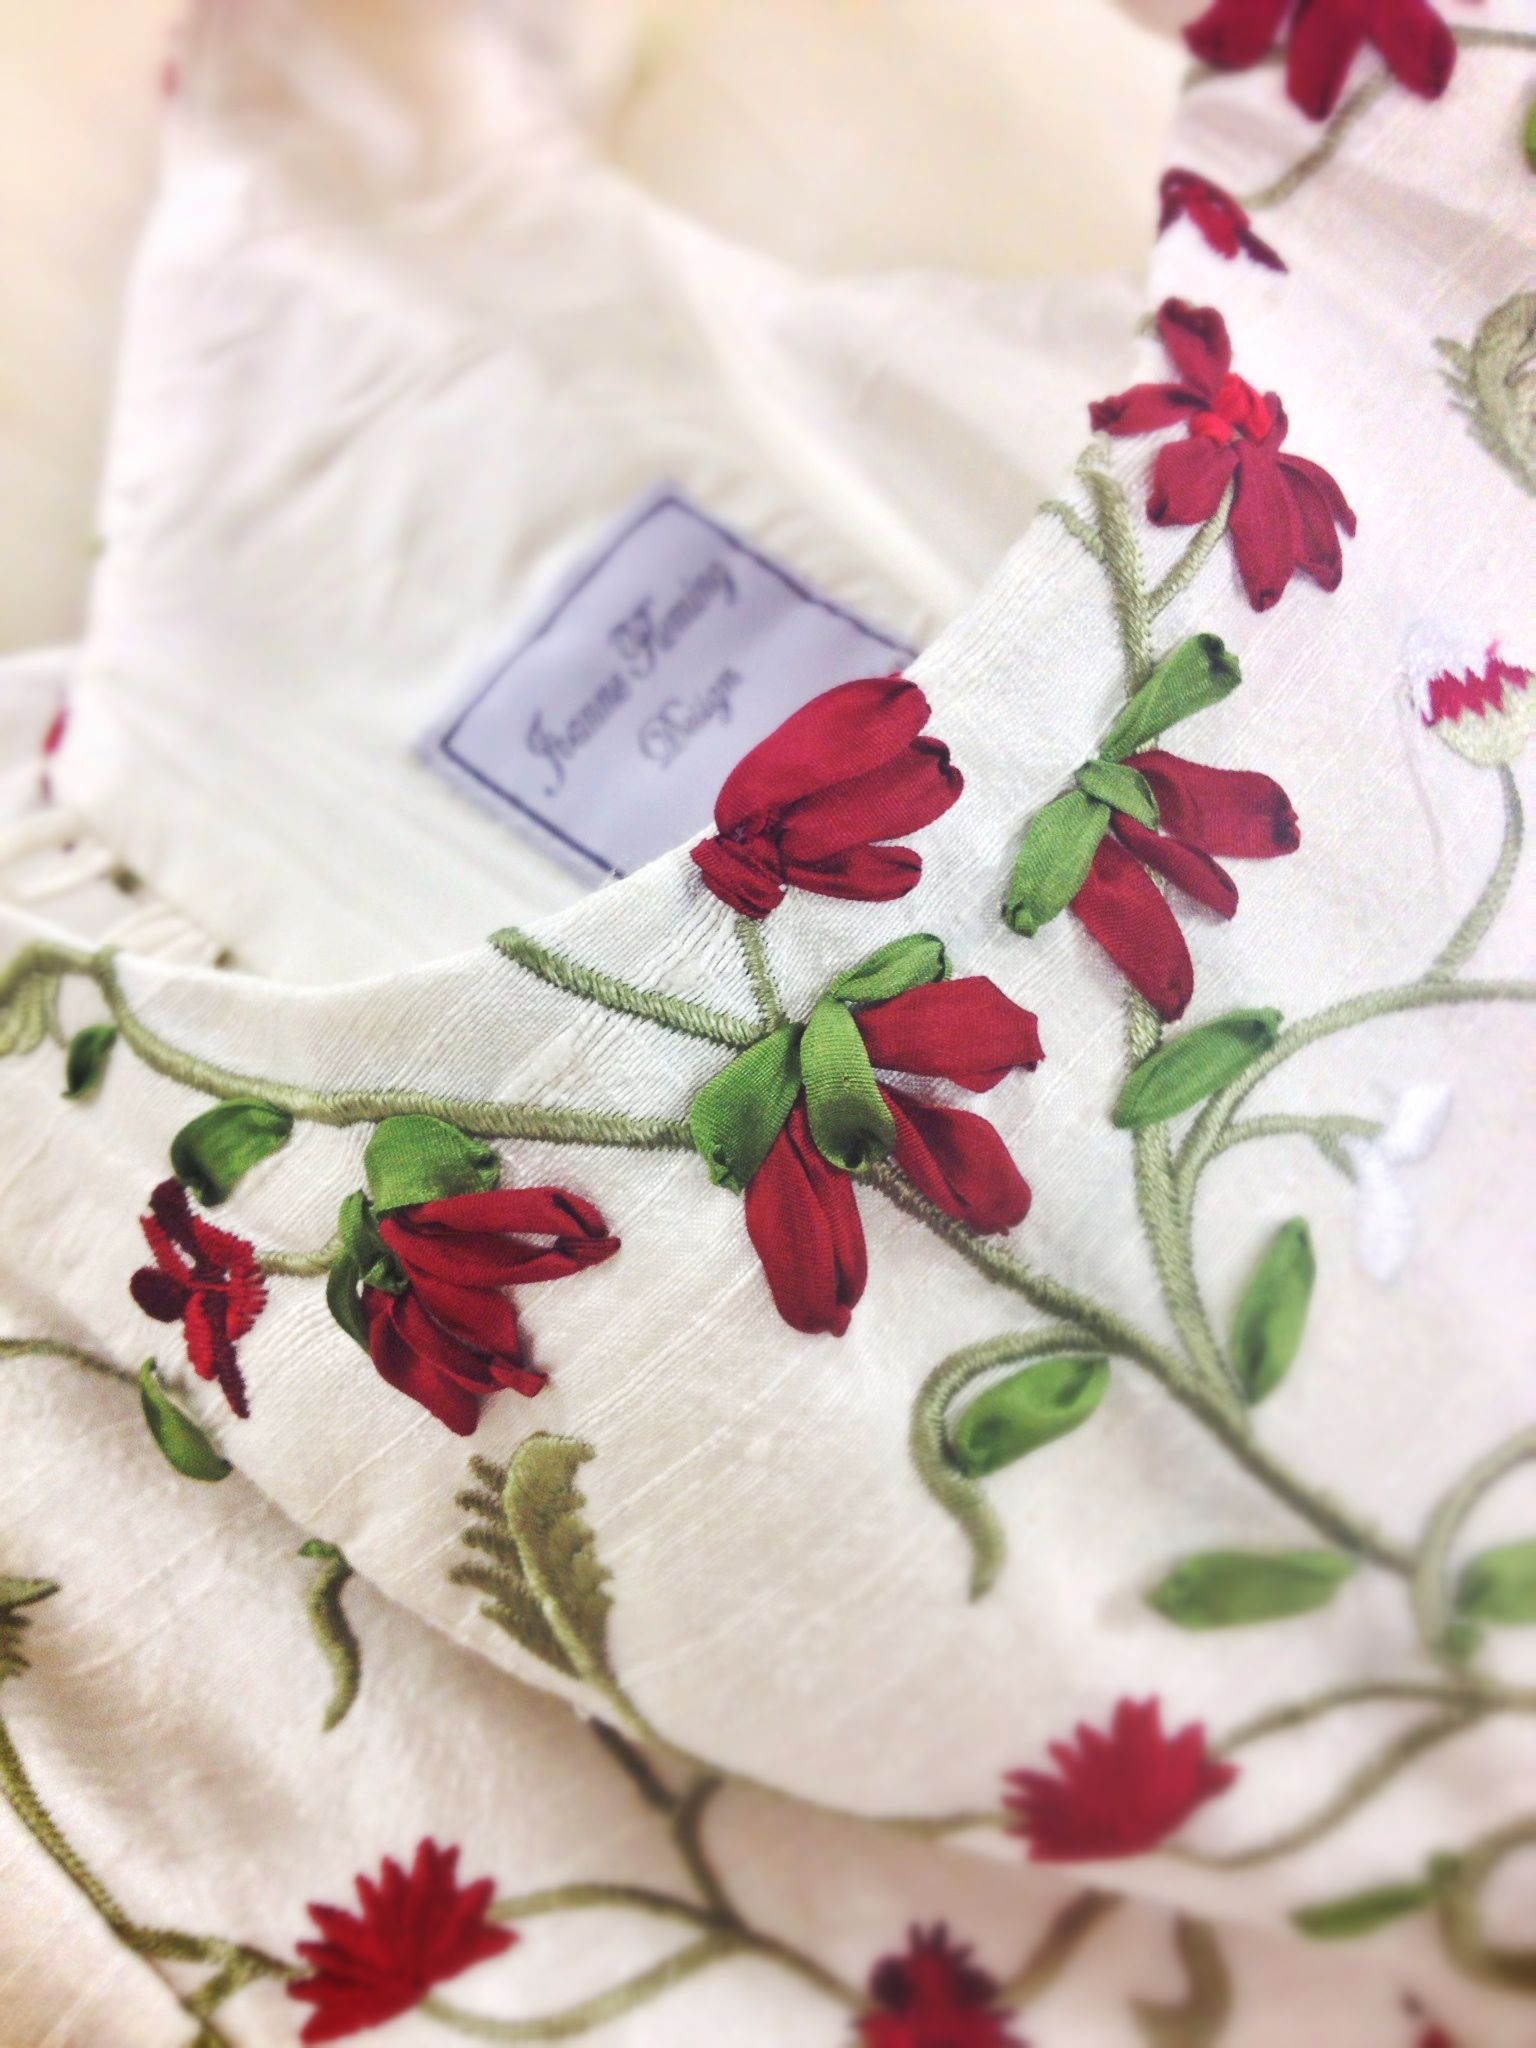 Ribbon embroidery bedspread designs - Claret Silk Ribbon Embroidery